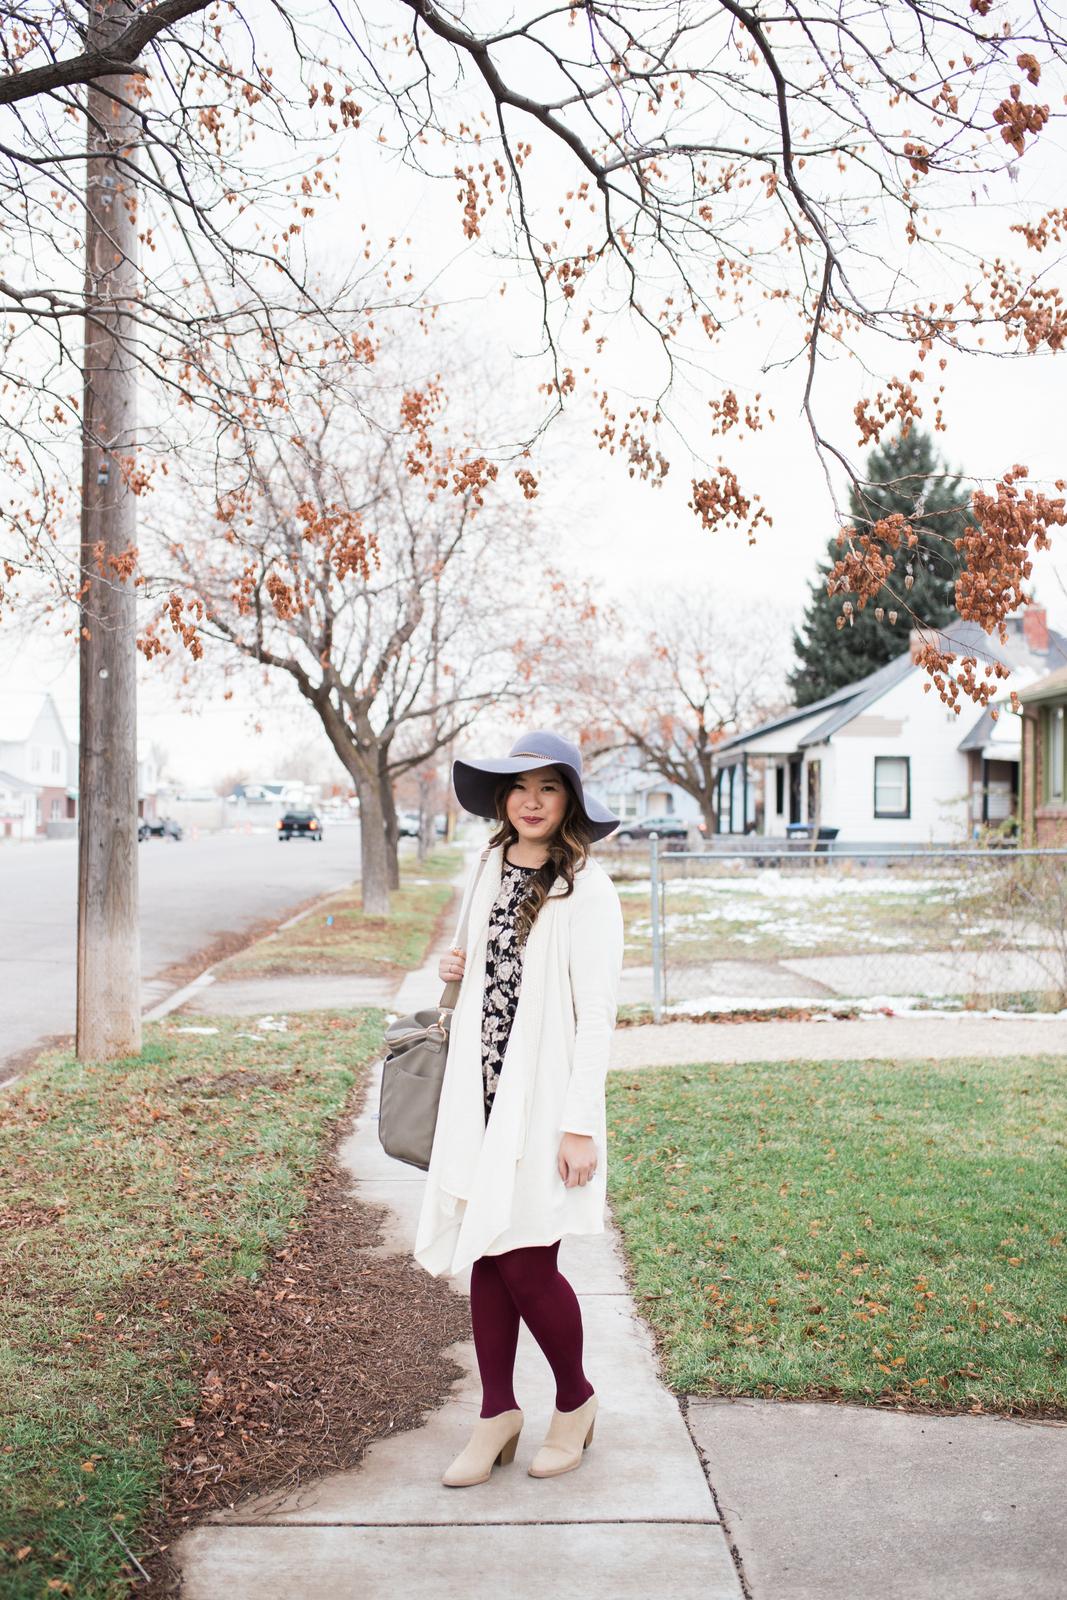 Payless Shoes Mules: latest winter fashion